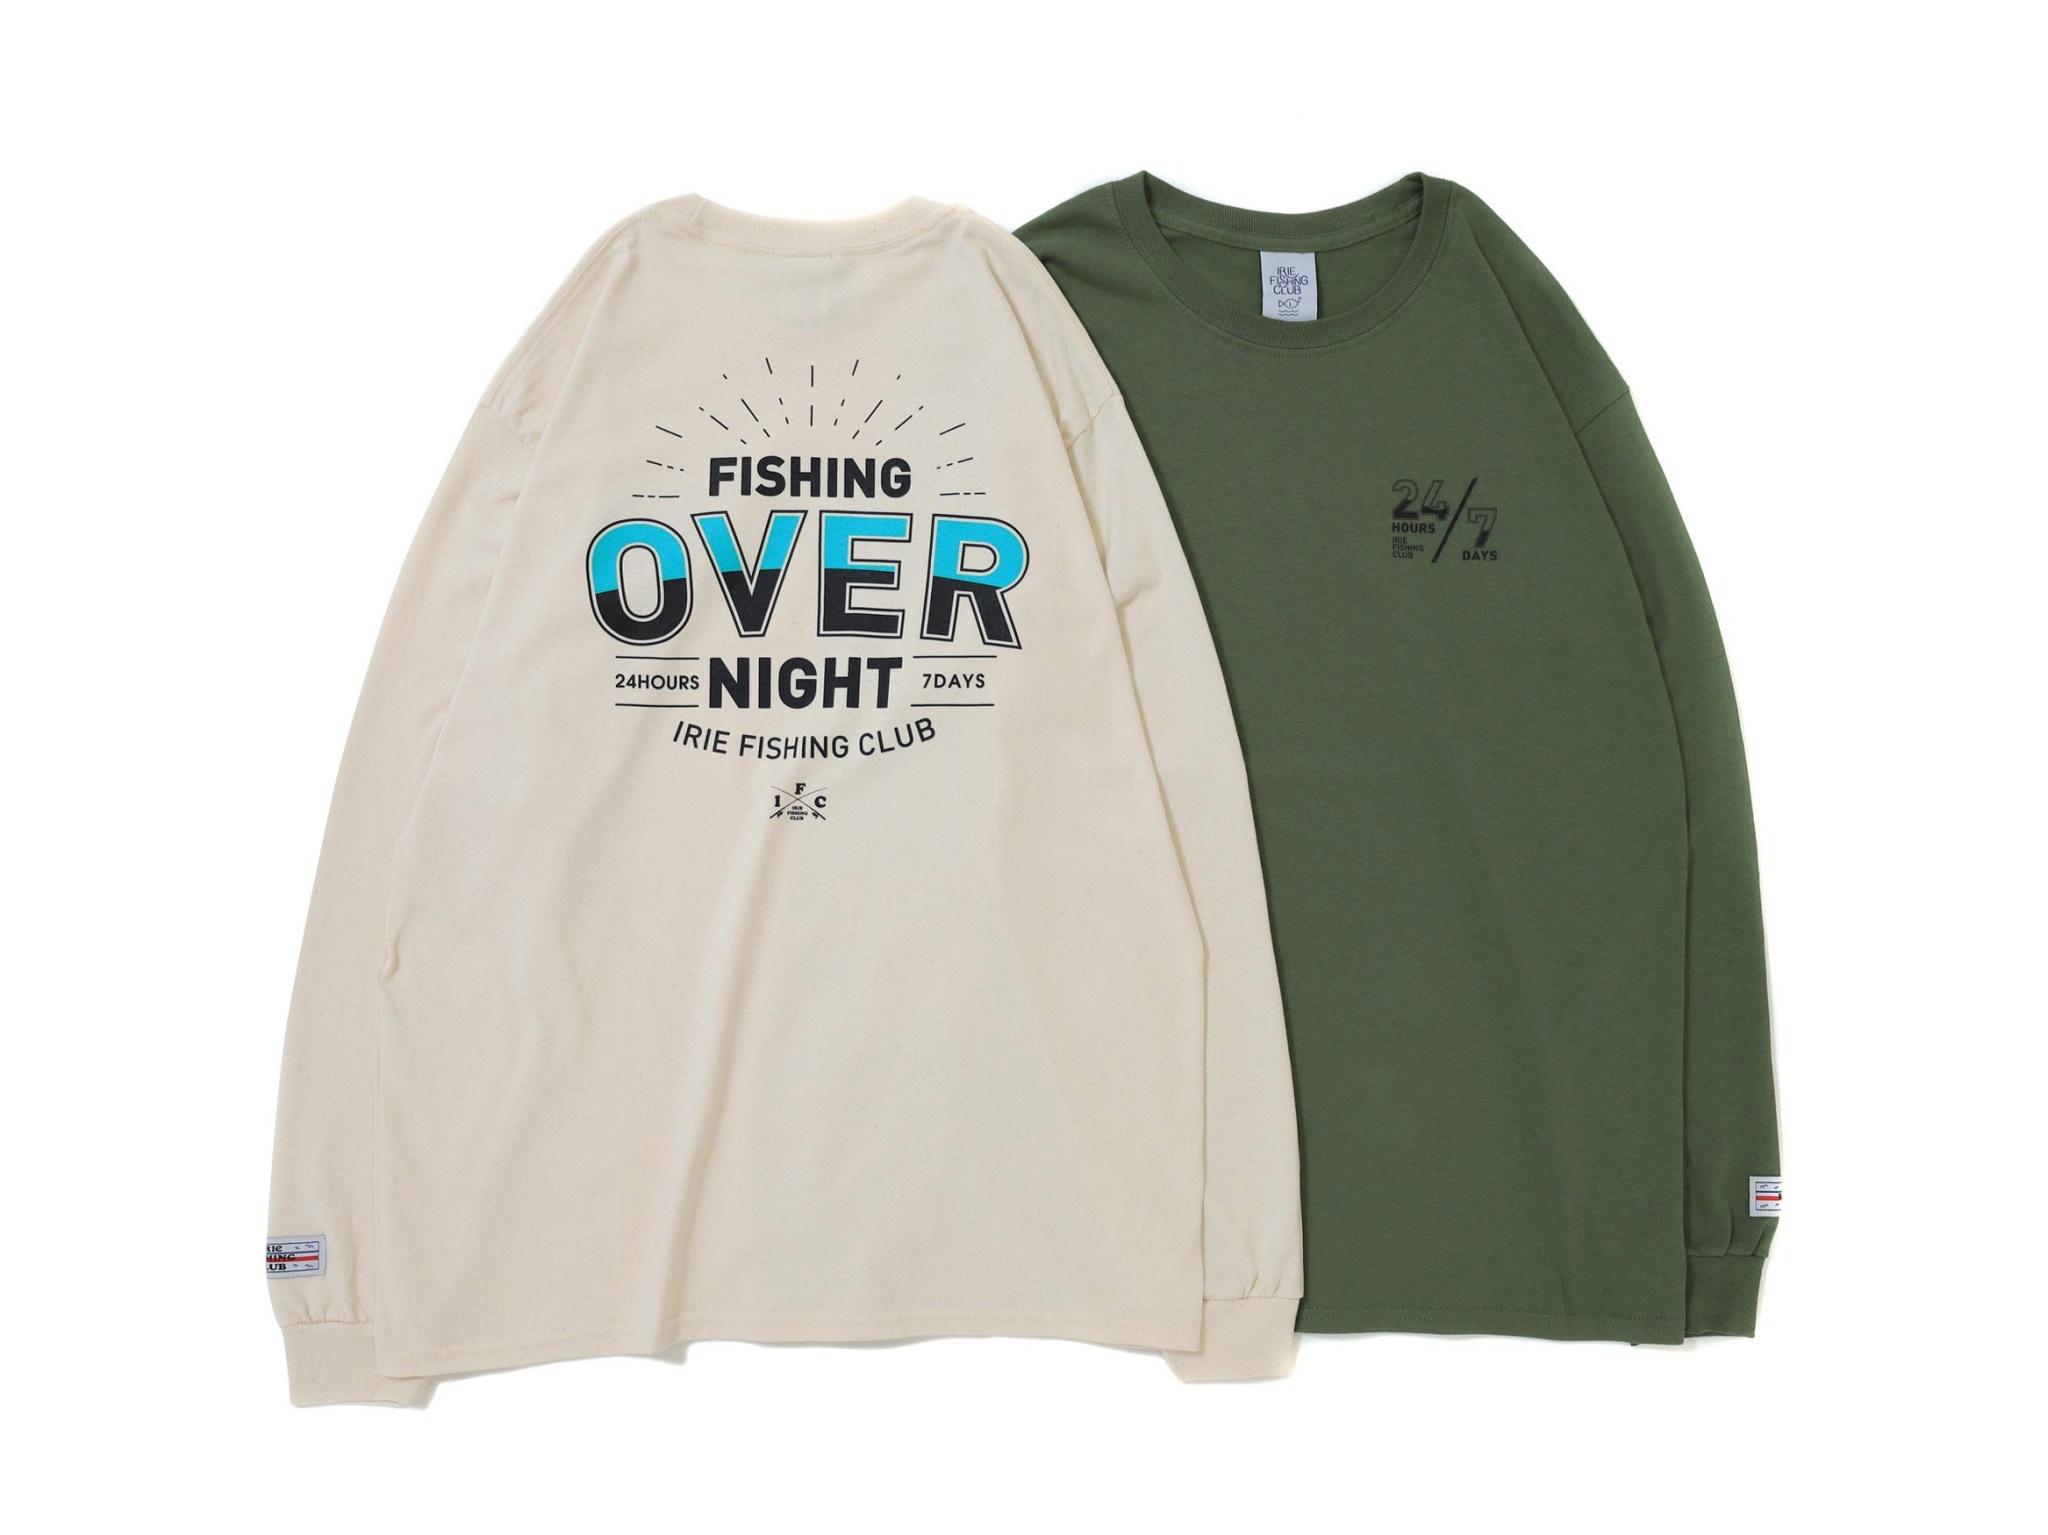 24/7 OVER NIGHT L/S TEE - IRIE FISHING CLUB